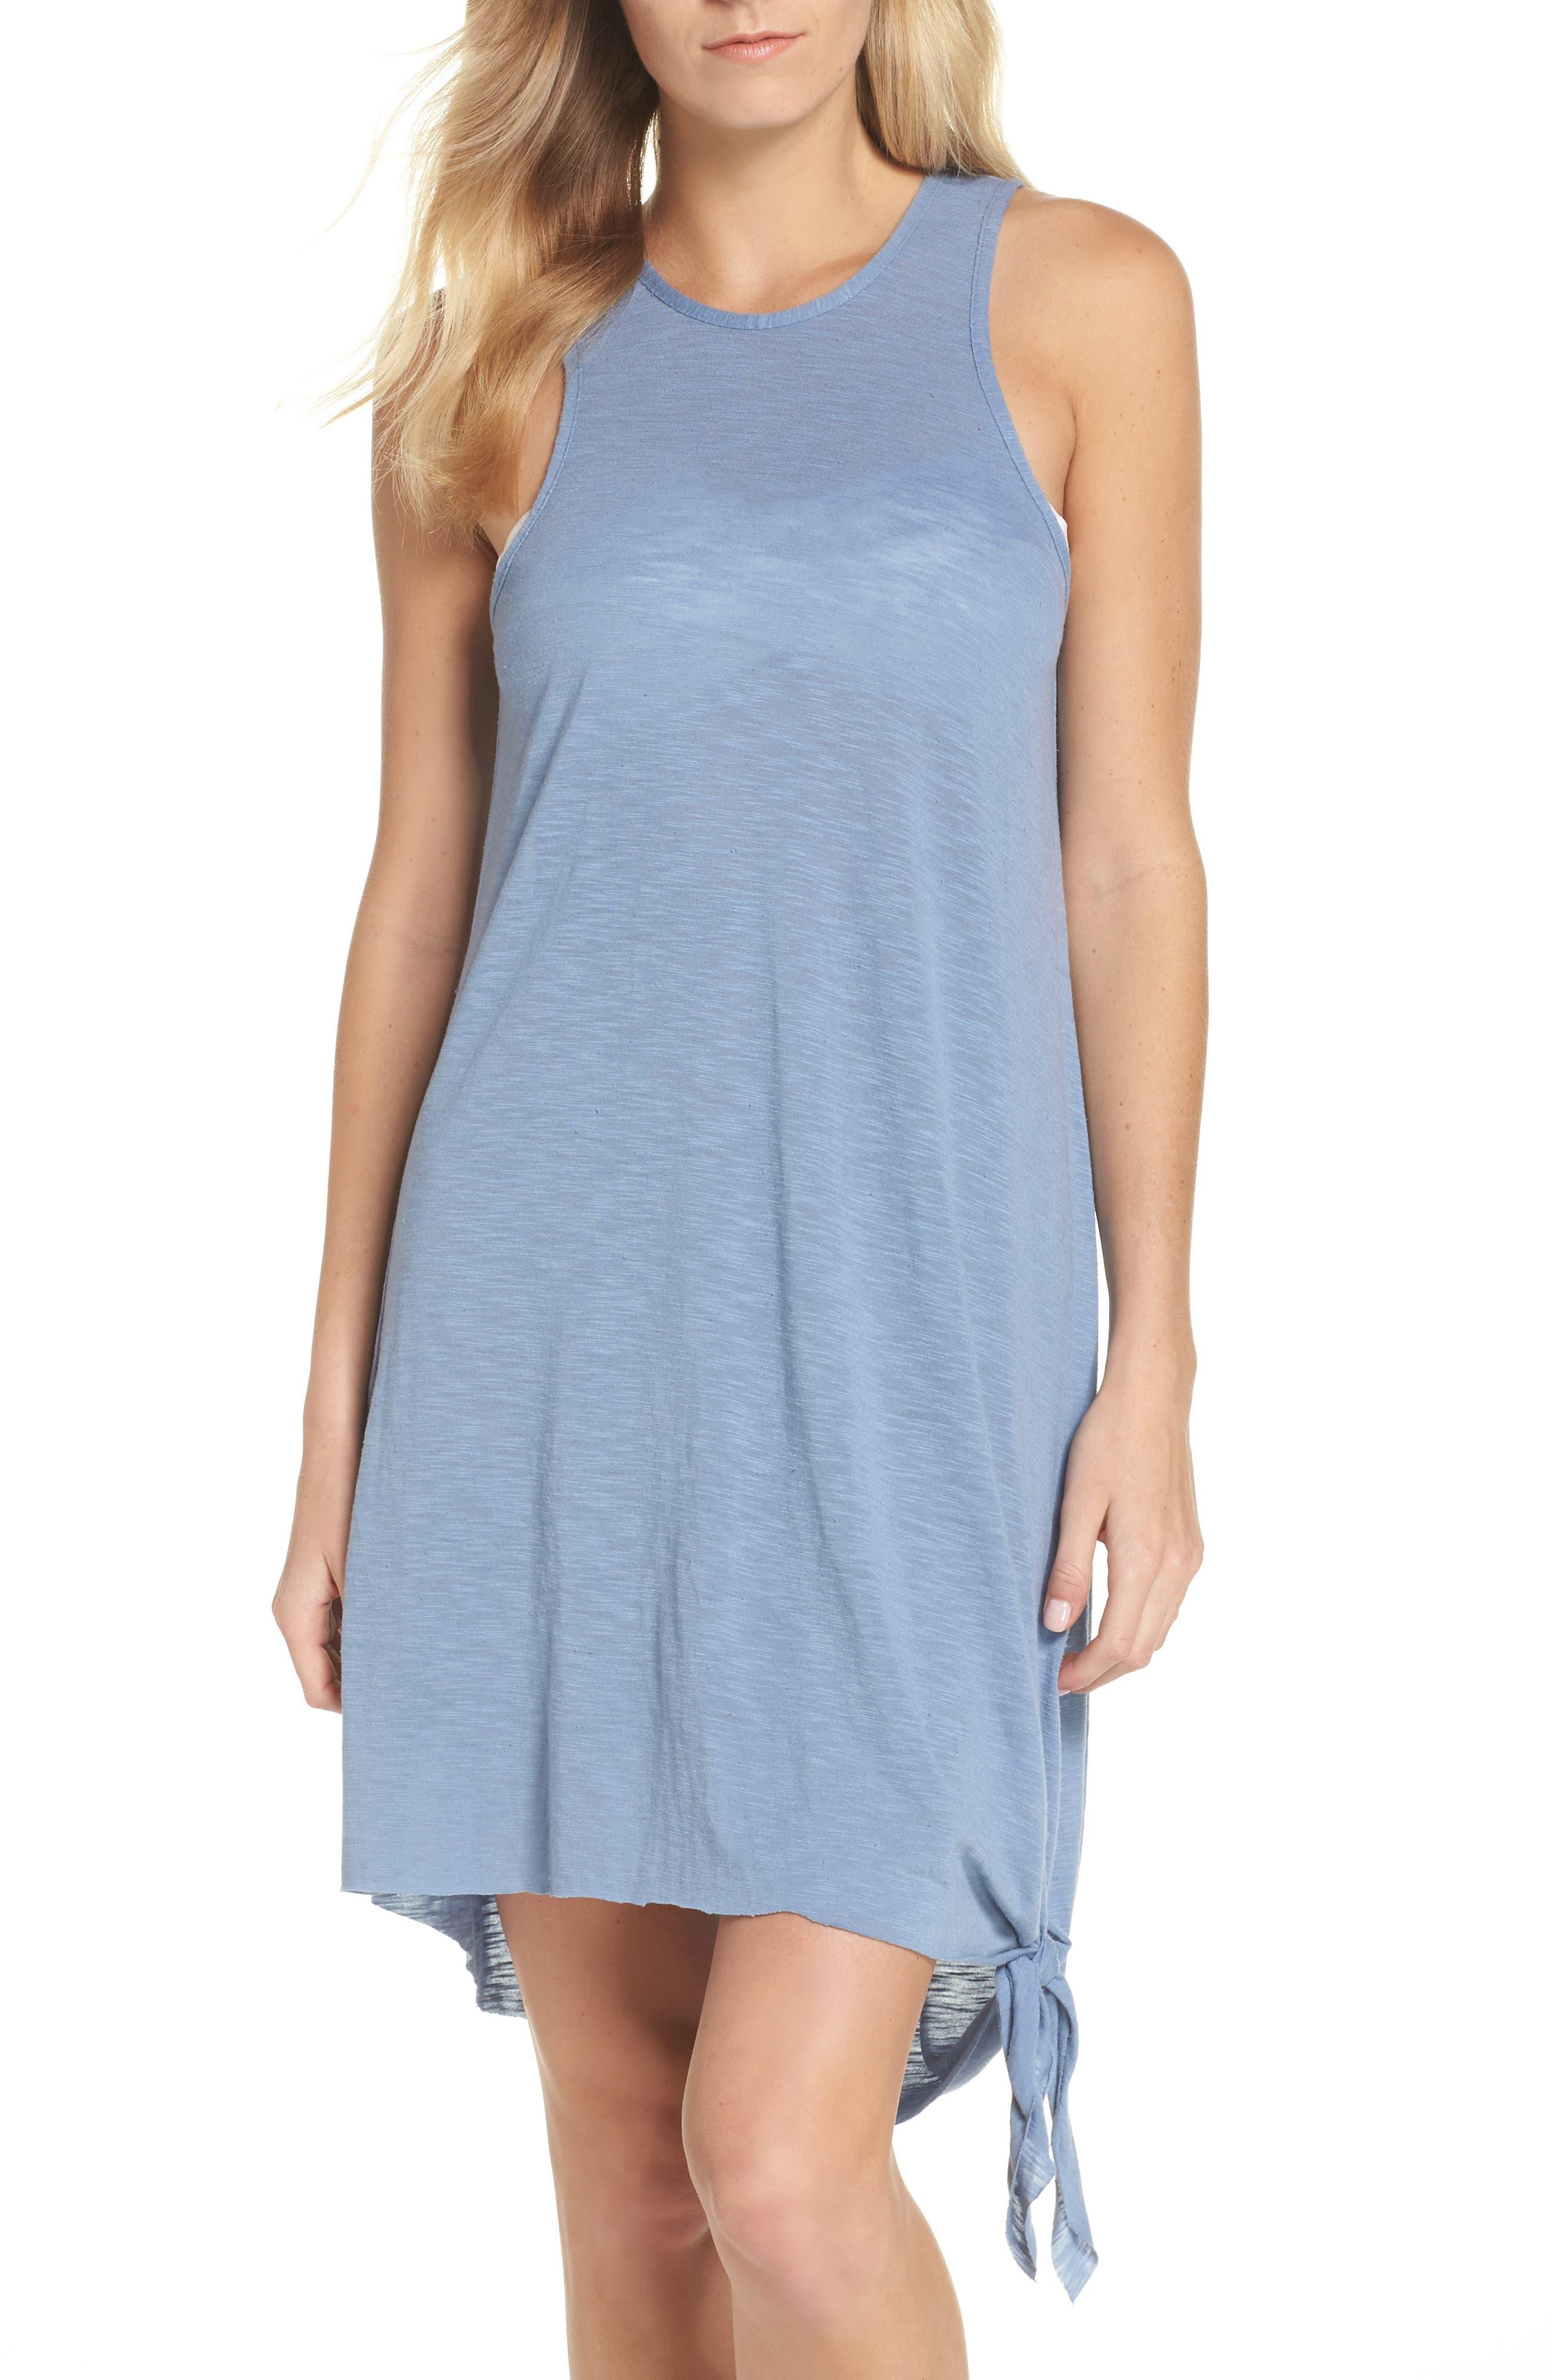 Breezy Basics Cover-Up Dress,                             Main thumbnail 1, color,                             Steel